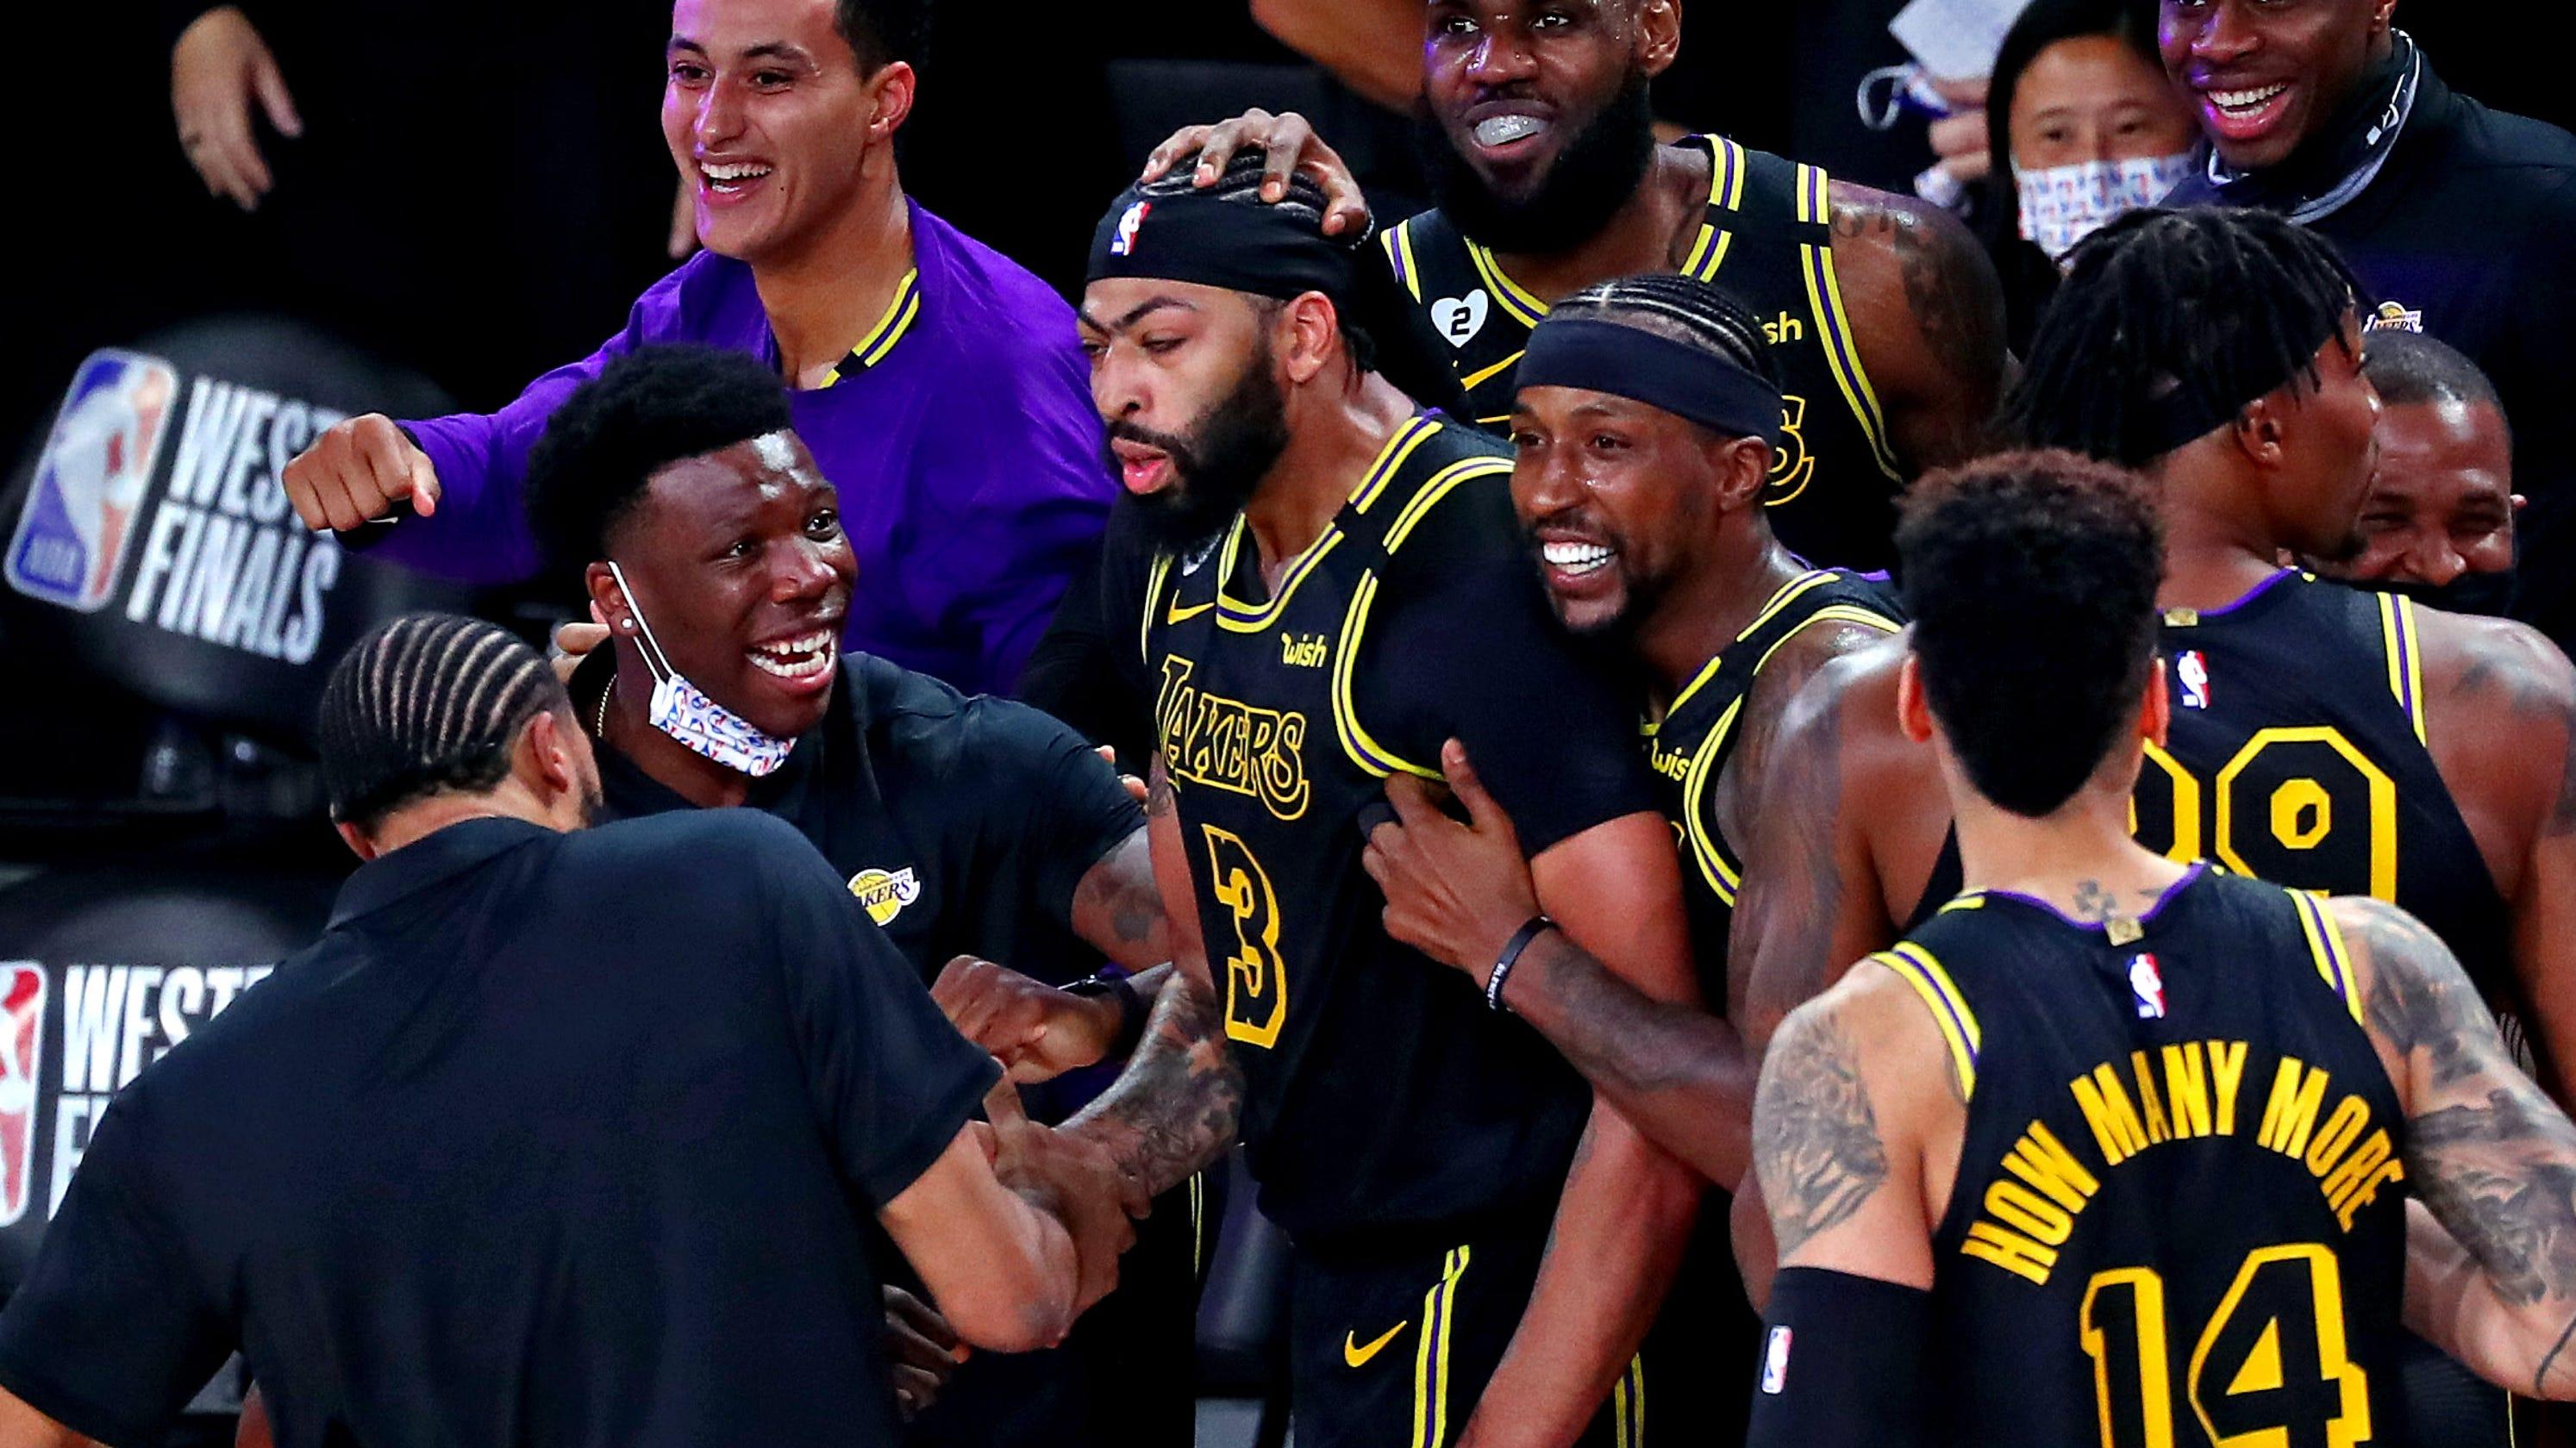 Lakers' Anthony Davis channels Kobe Bryant on game-winning shot